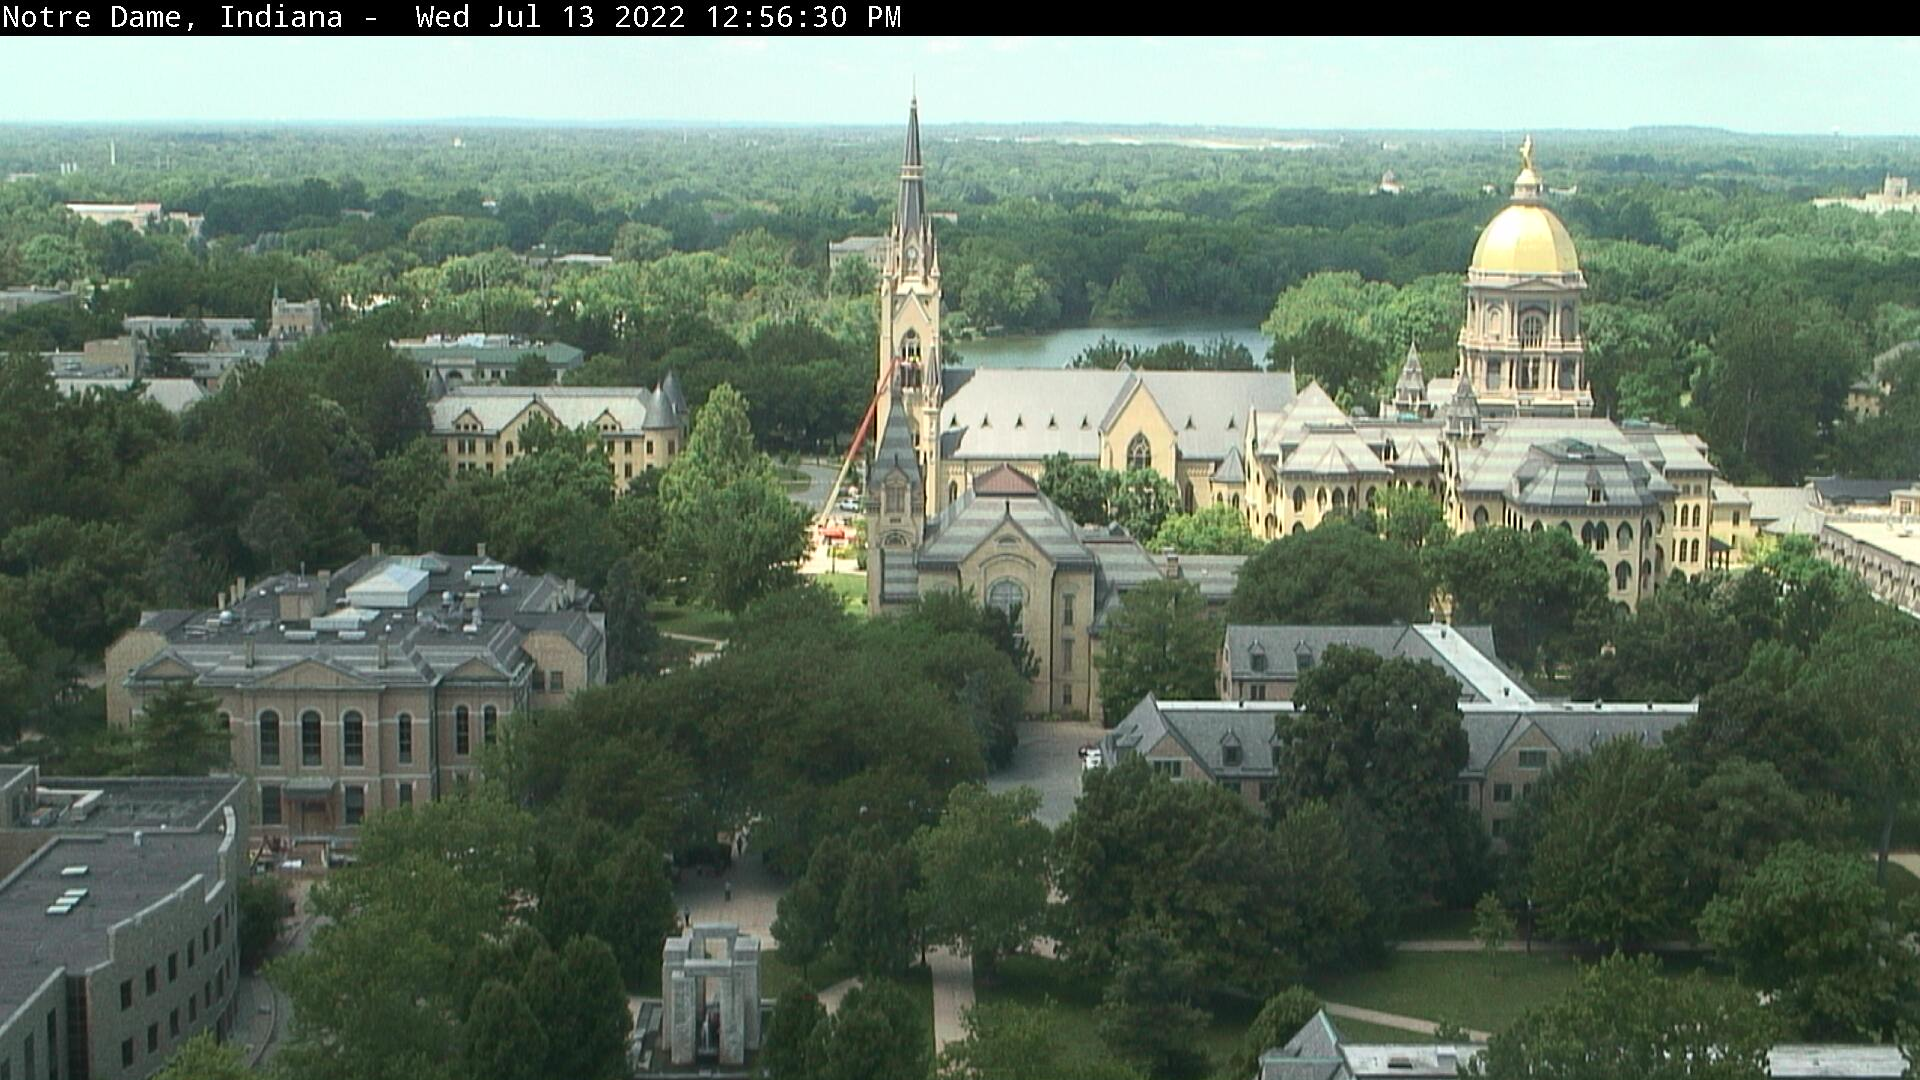 Notre Dame, Indiana Sat. 12:56